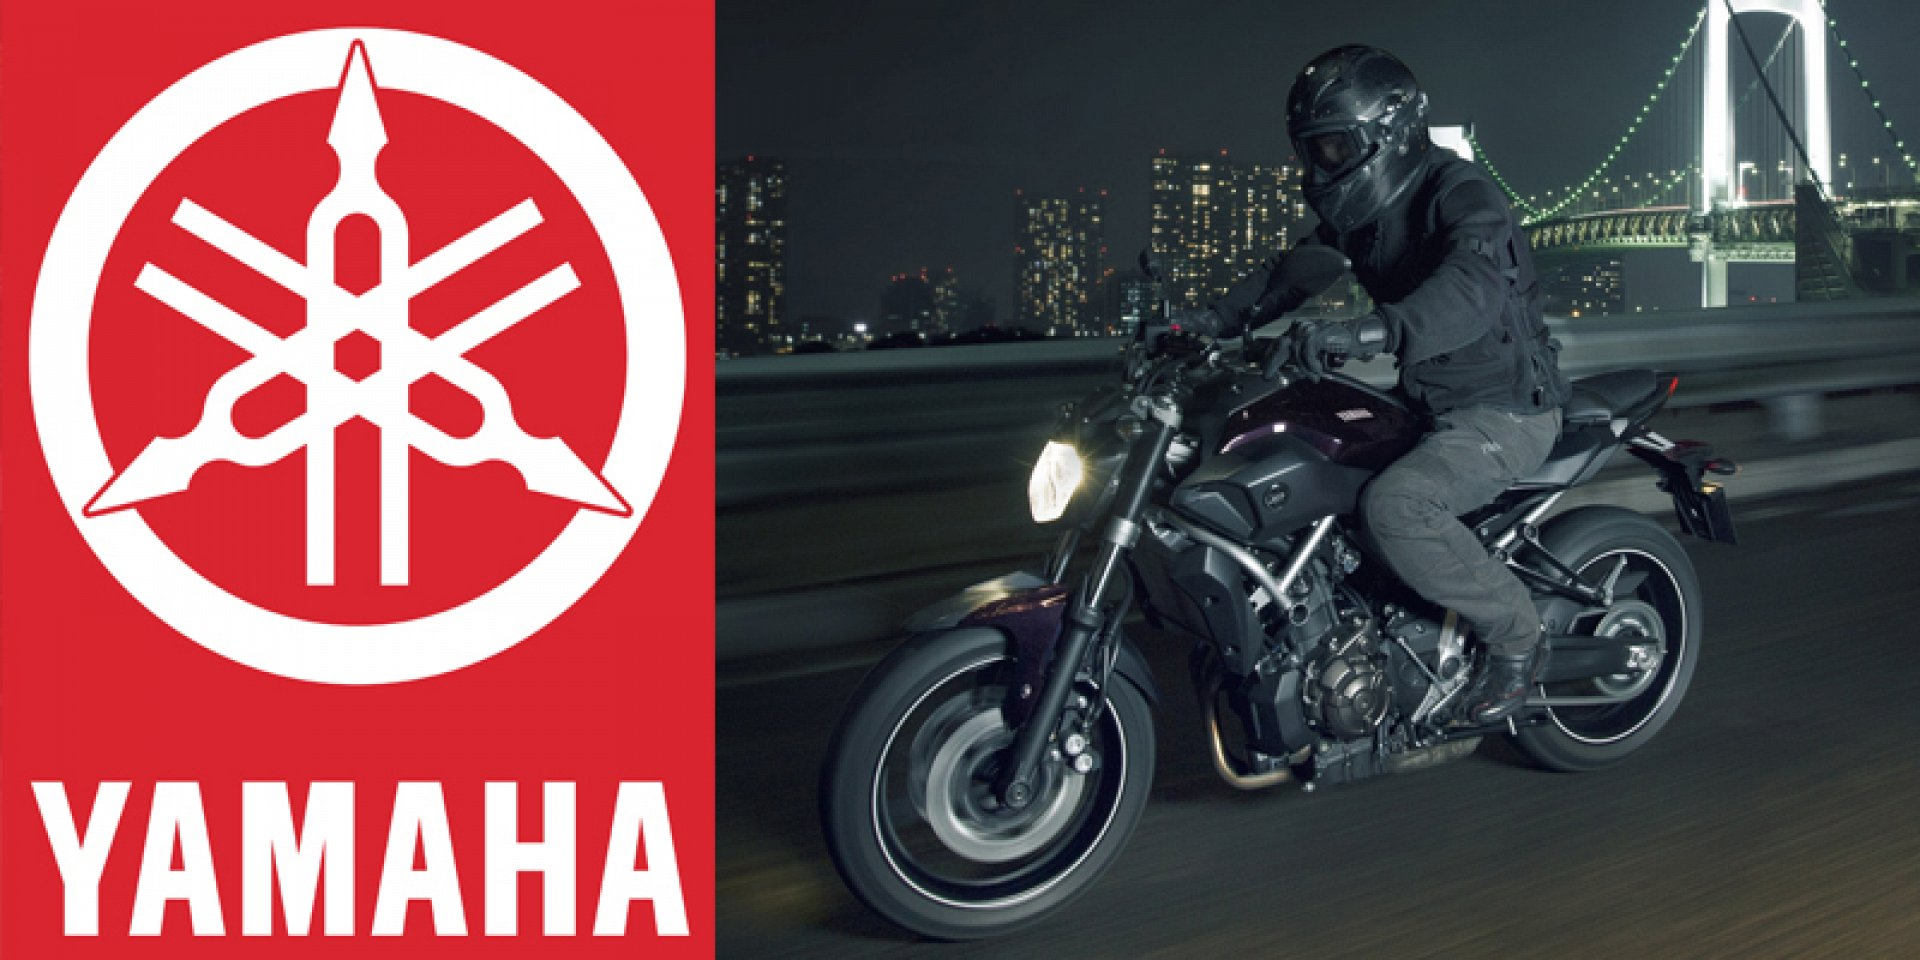 Closest Yamaha Dealer